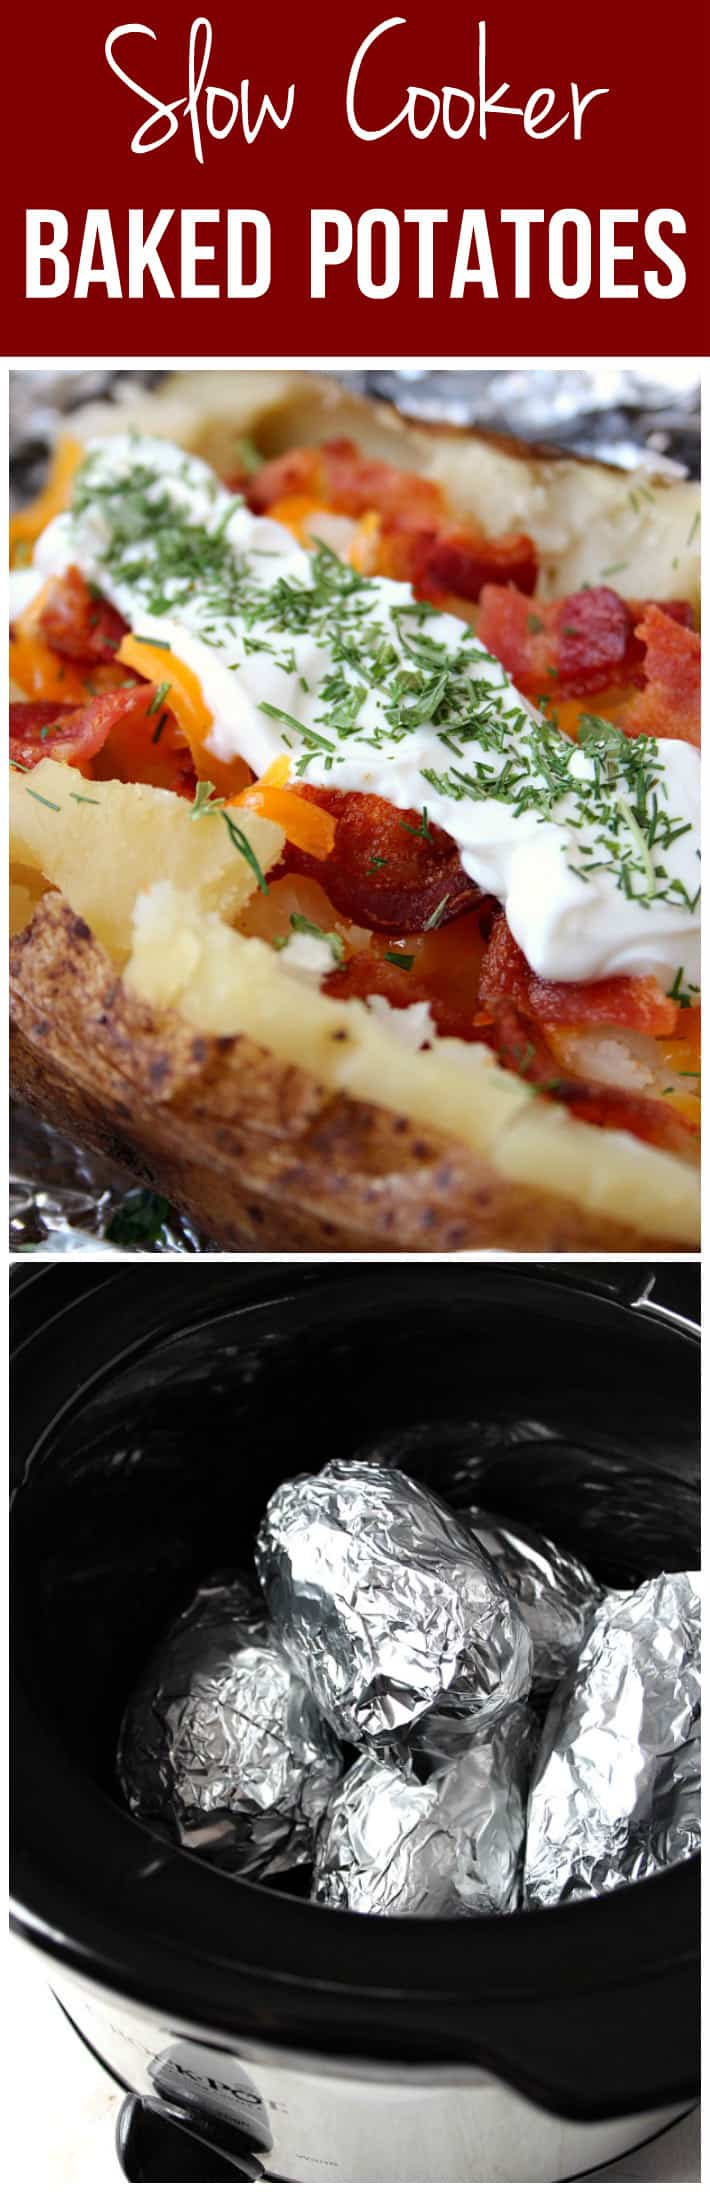 slow cooker baked potatoes recipe long3 Slow Cooker Baked Potatoes ...